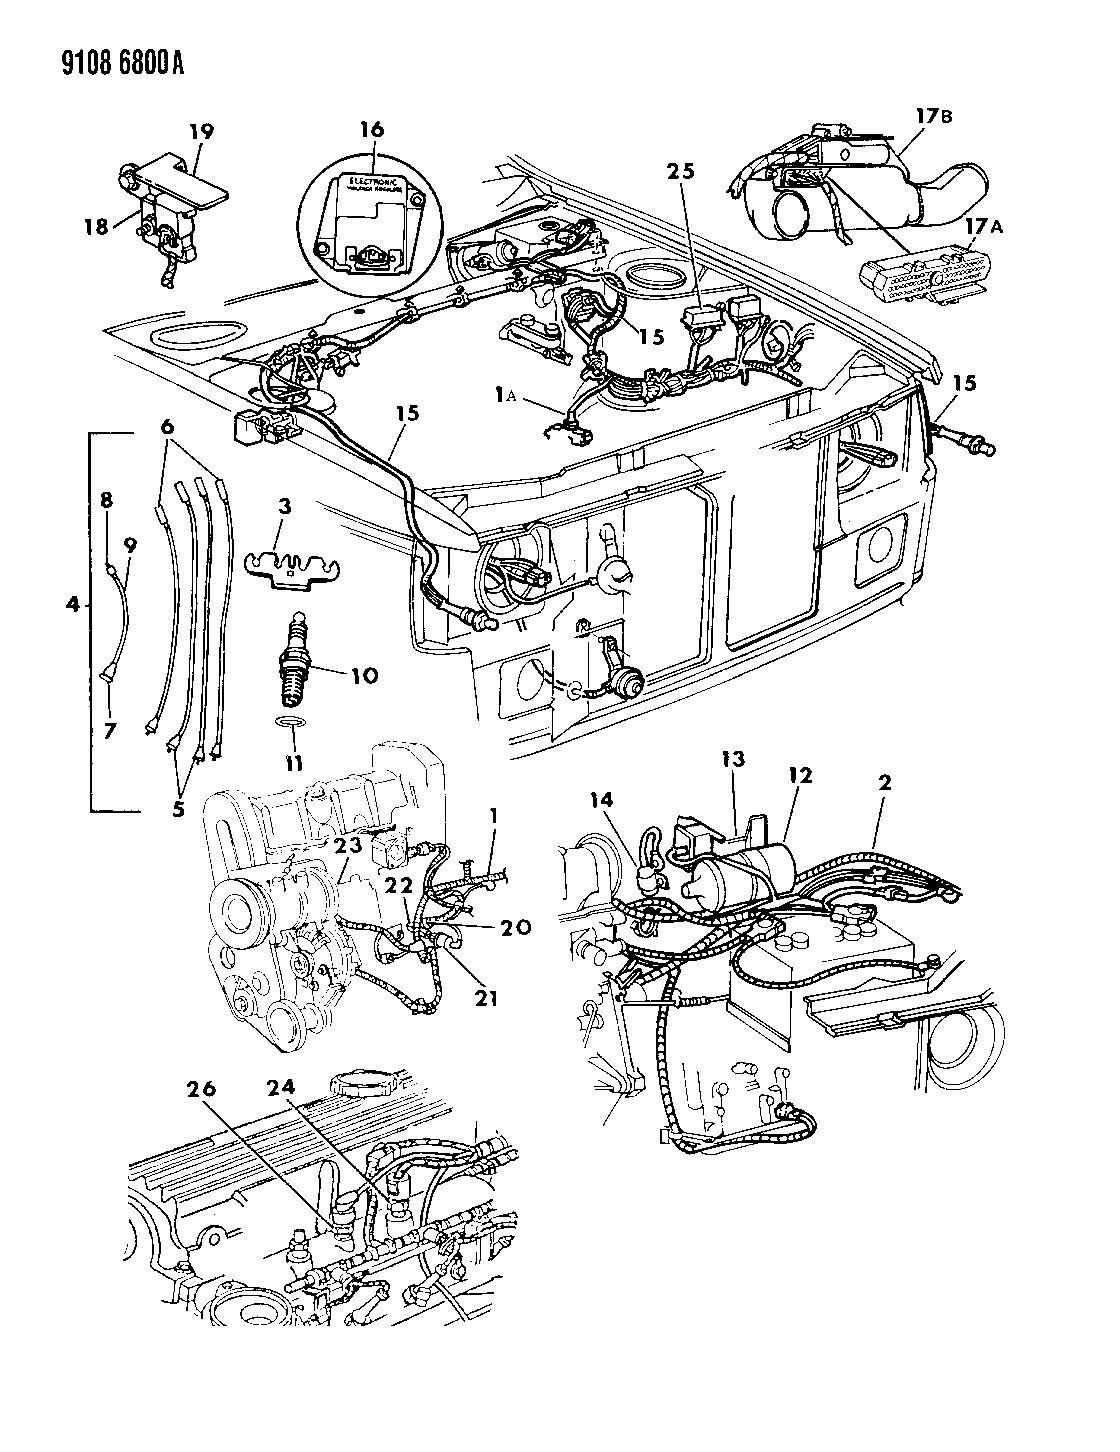 dodge omni wiring diagram